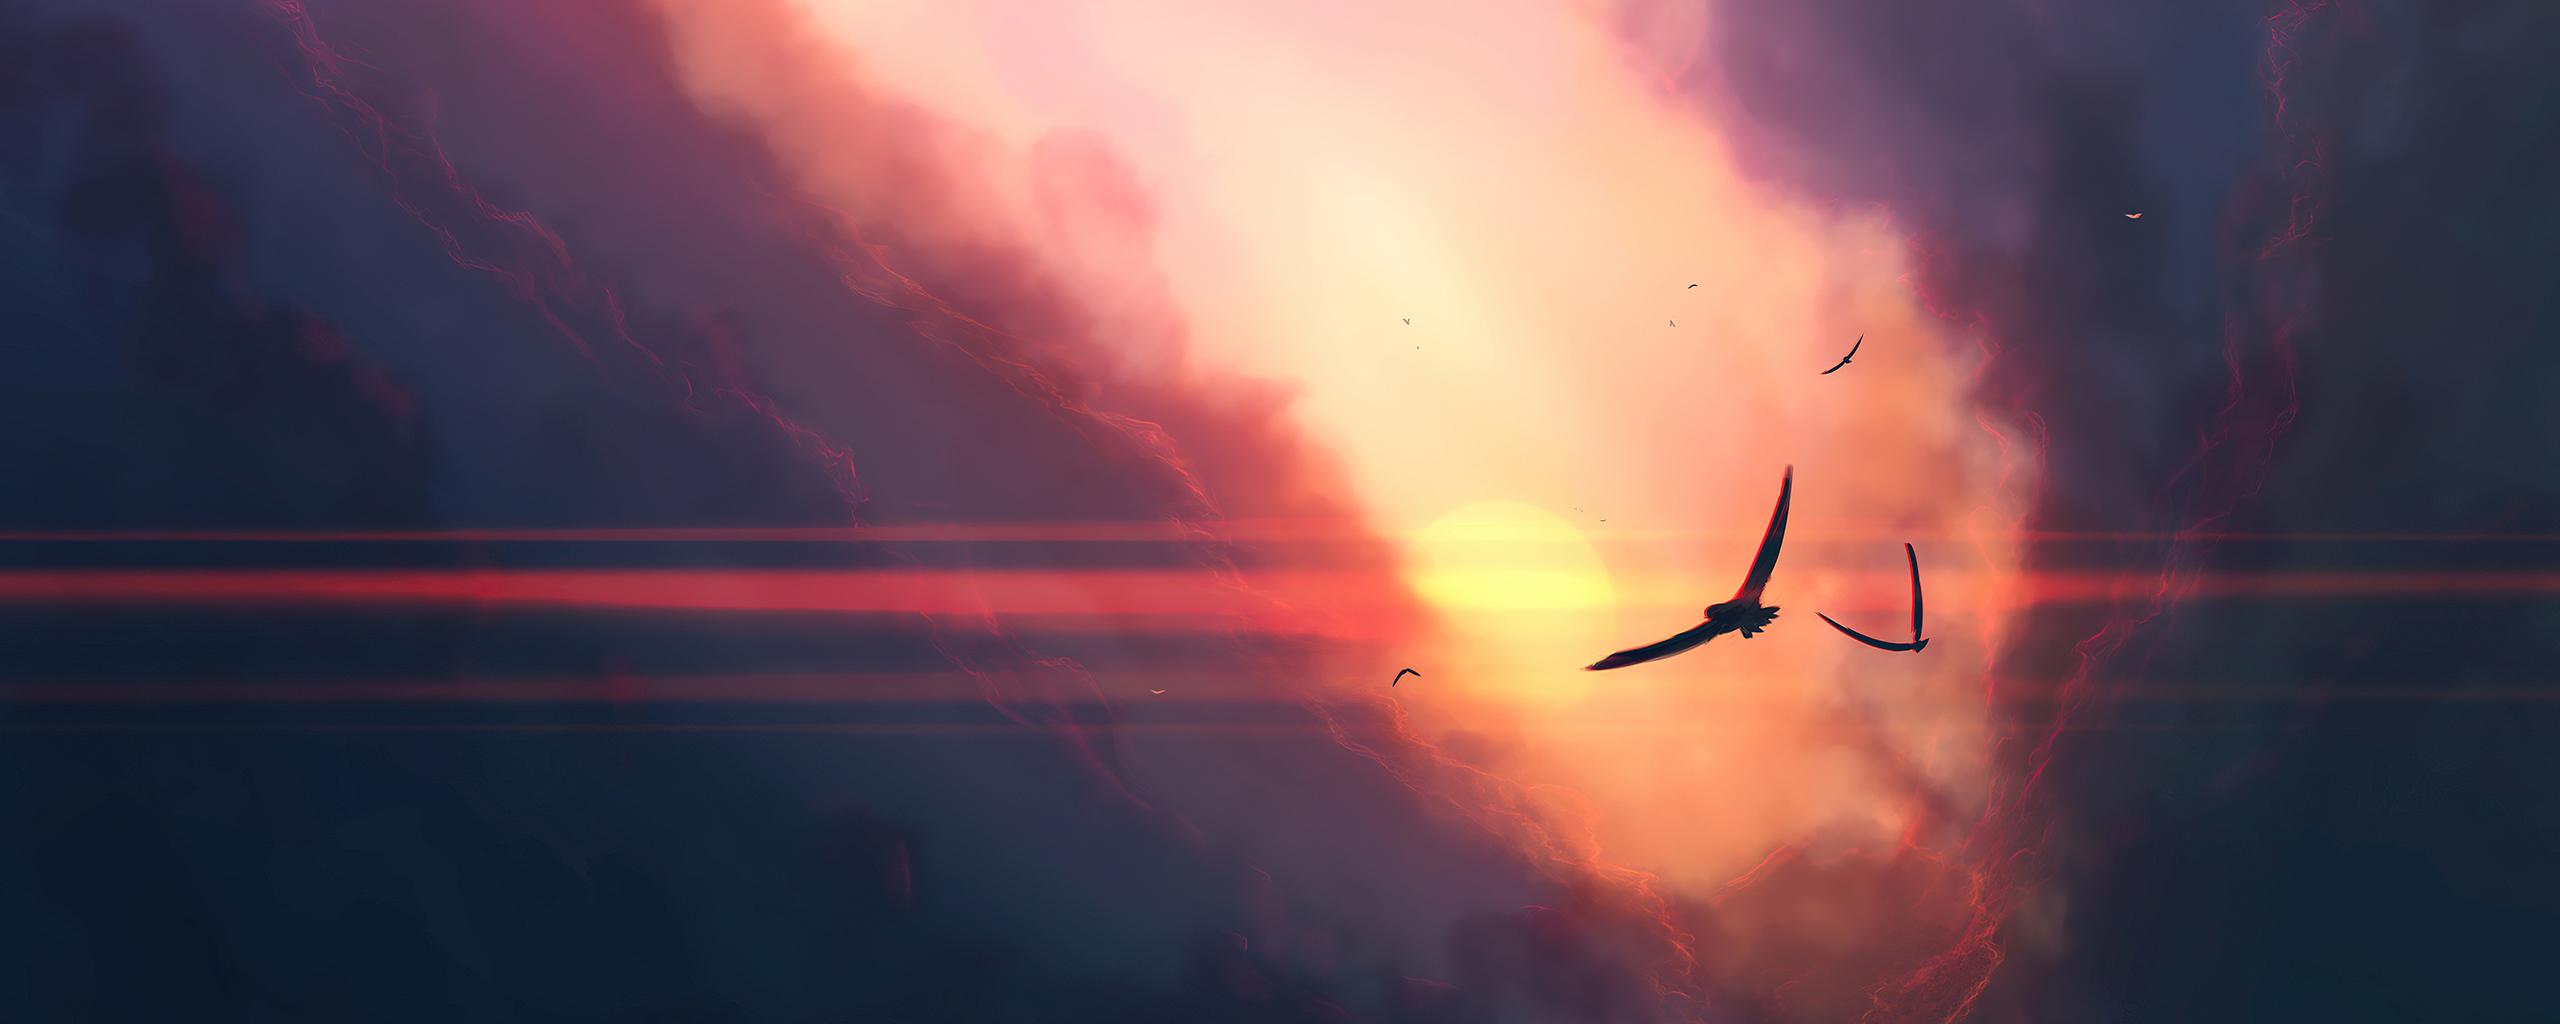 birds-sunset-clouds-4k-j0.jpg